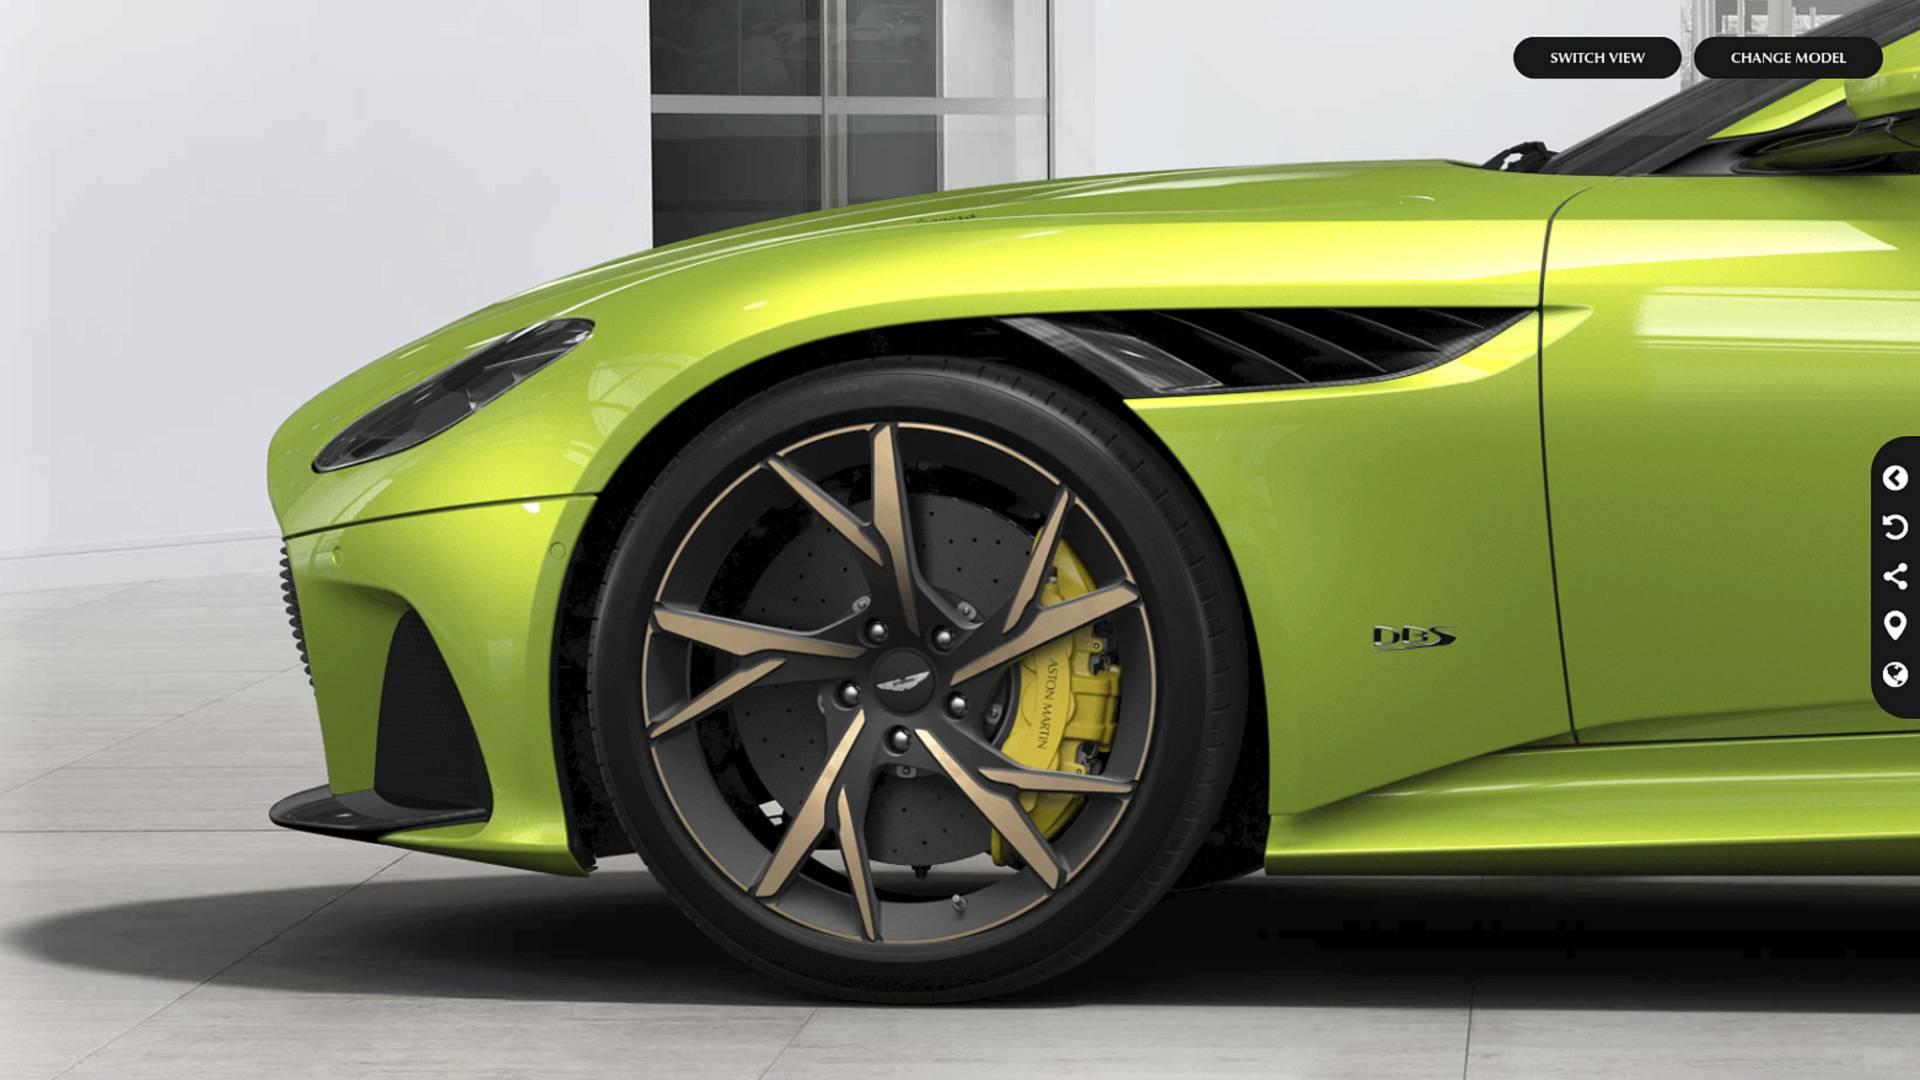 Aston Martin Dbs Superleggera Online Configurator Motor1 Com Photos